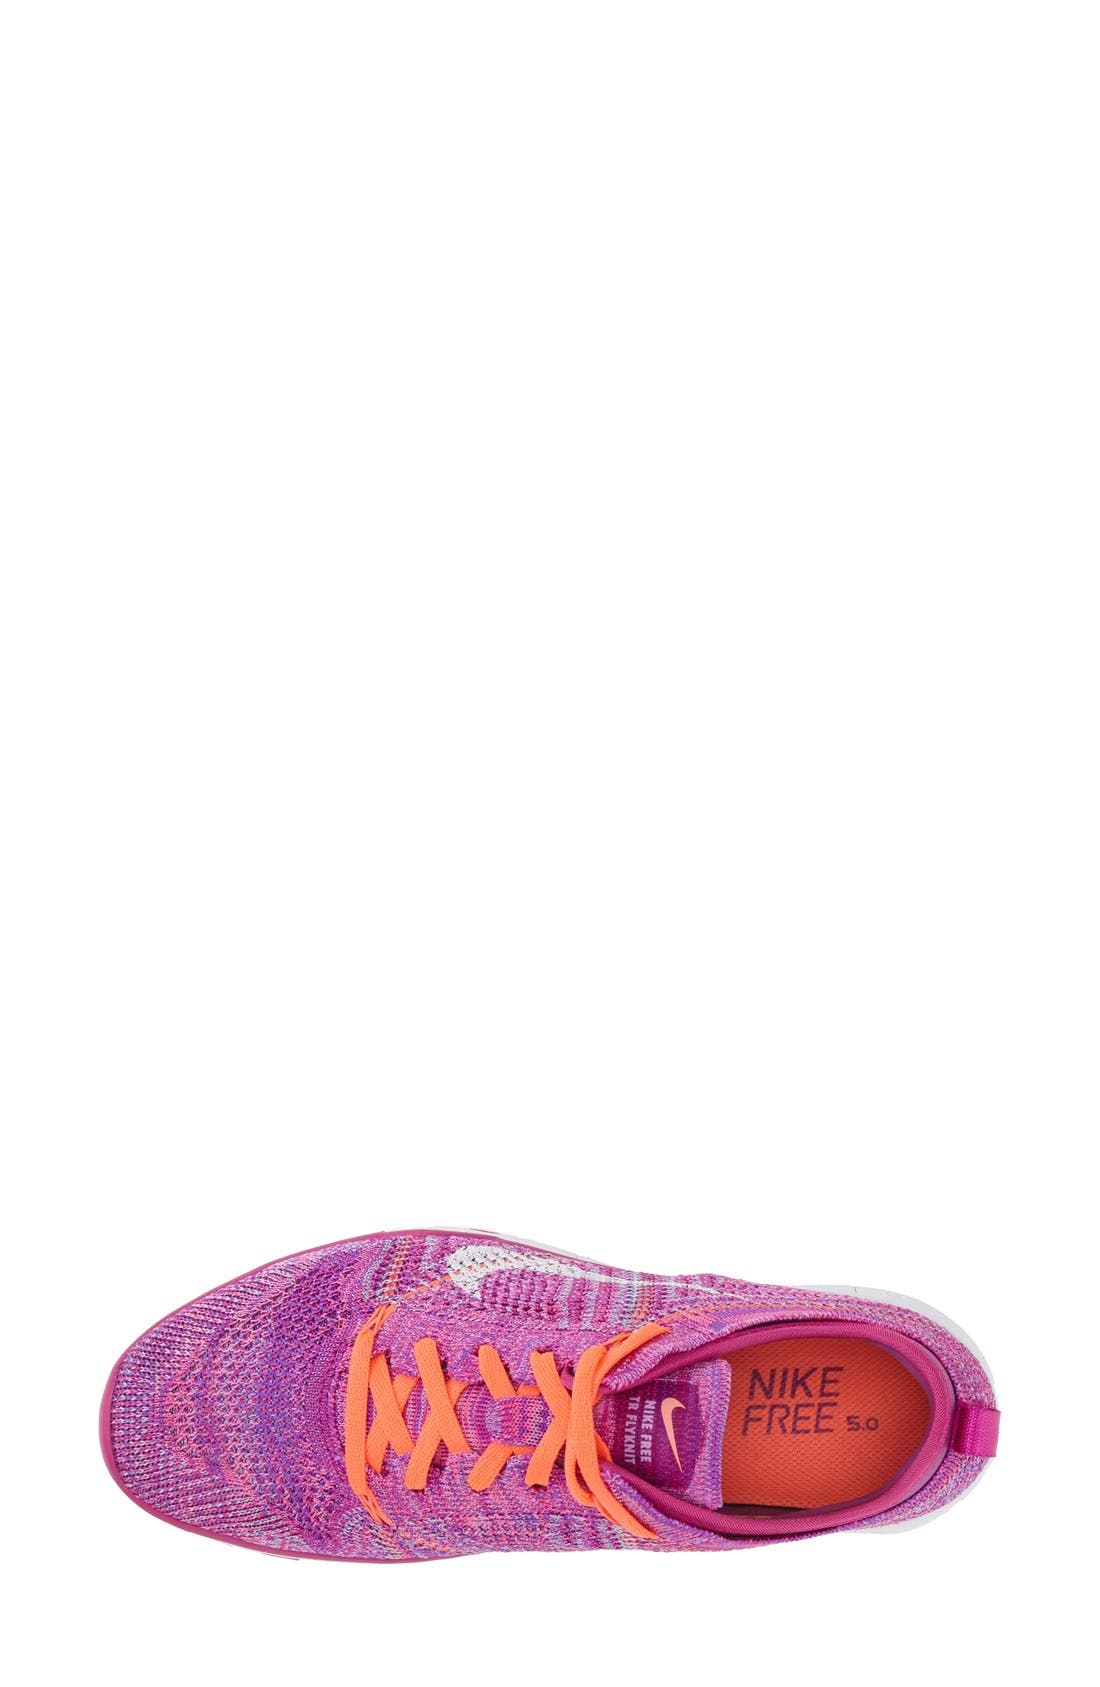 ,                             'Free Flyknit 5.0 TR' Training Shoe,                             Alternate thumbnail 41, color,                             500